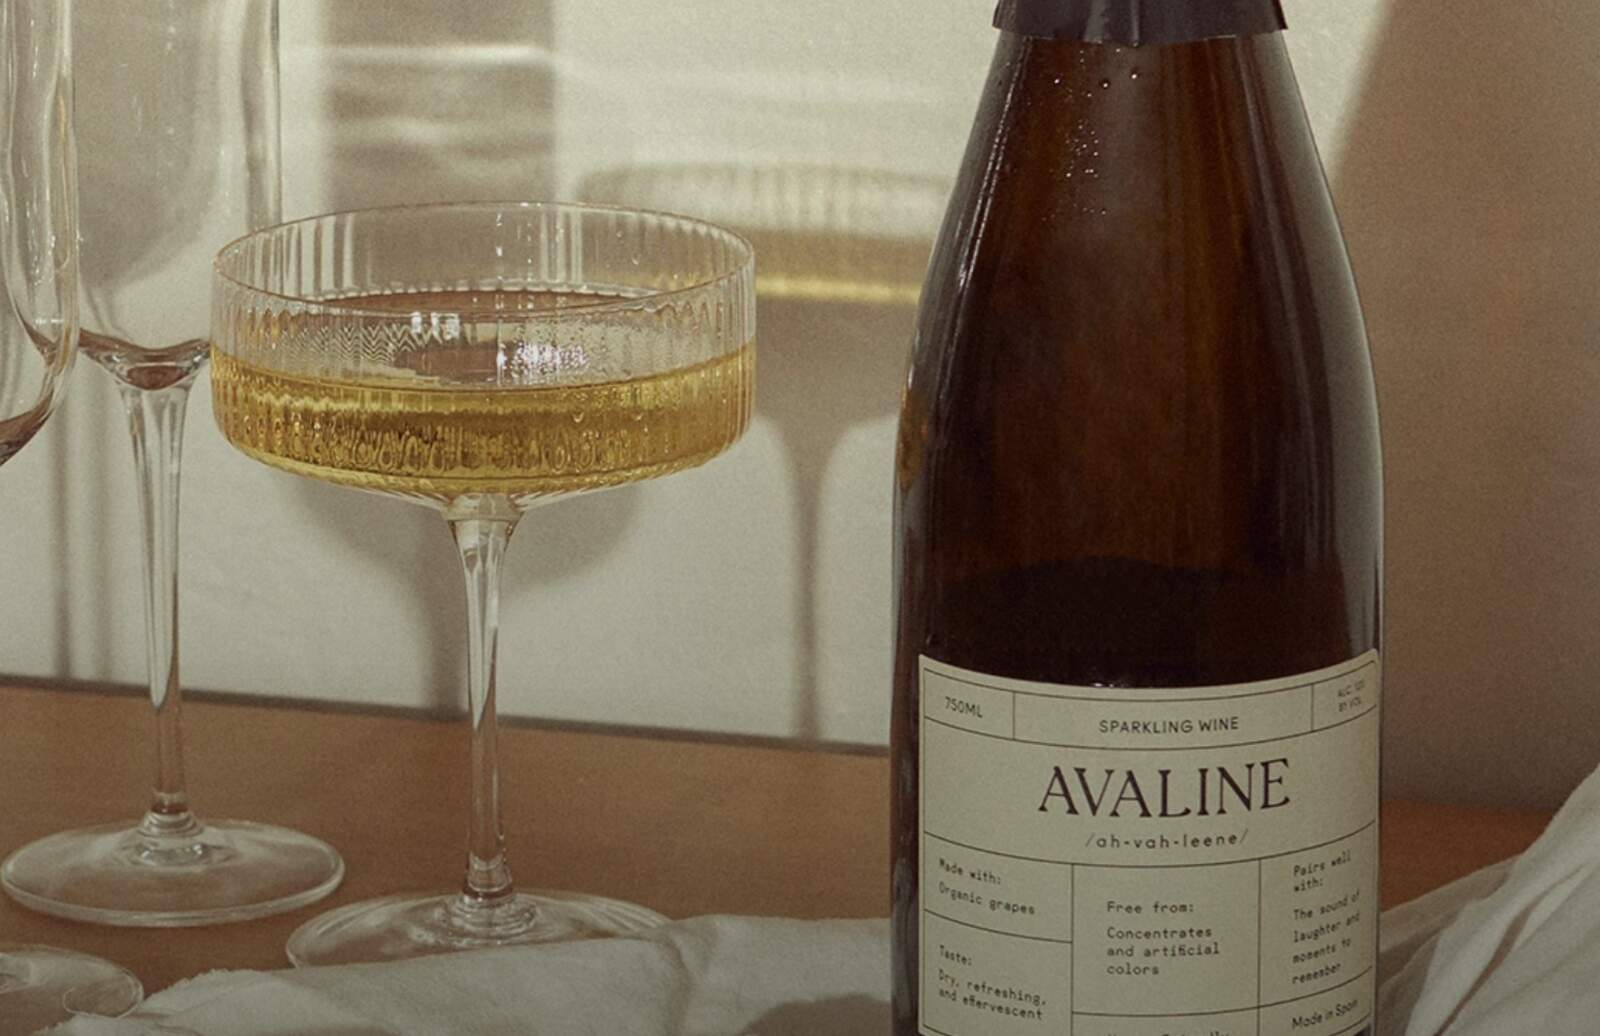 Avaline Sparkling, l'escumós de Cameron Díaz que elabora Raventós i Blanc